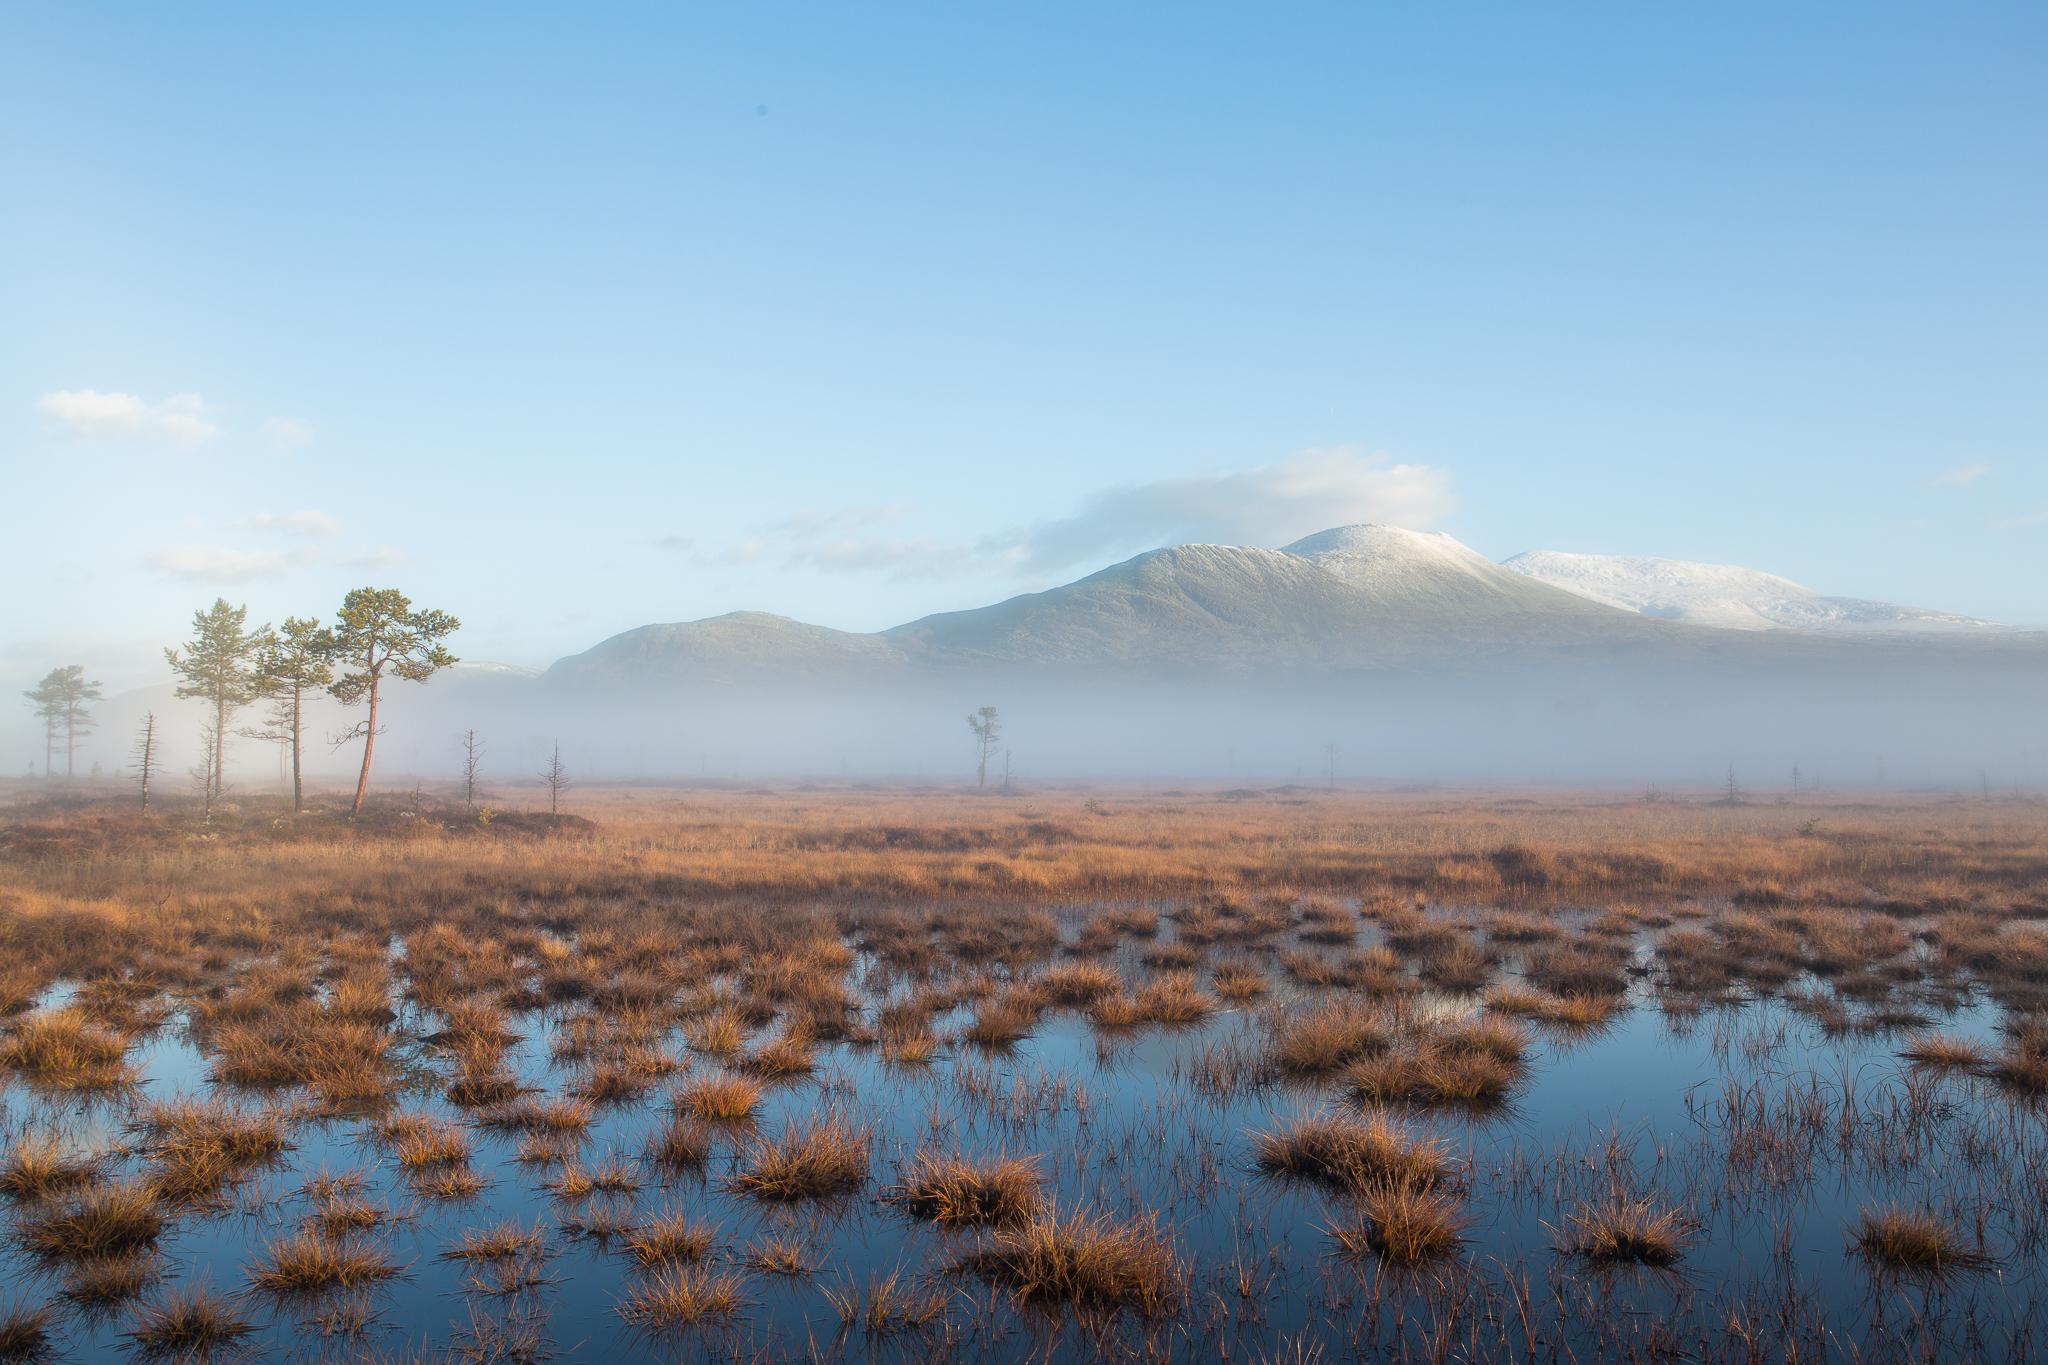 Sølen landskapsvernområde